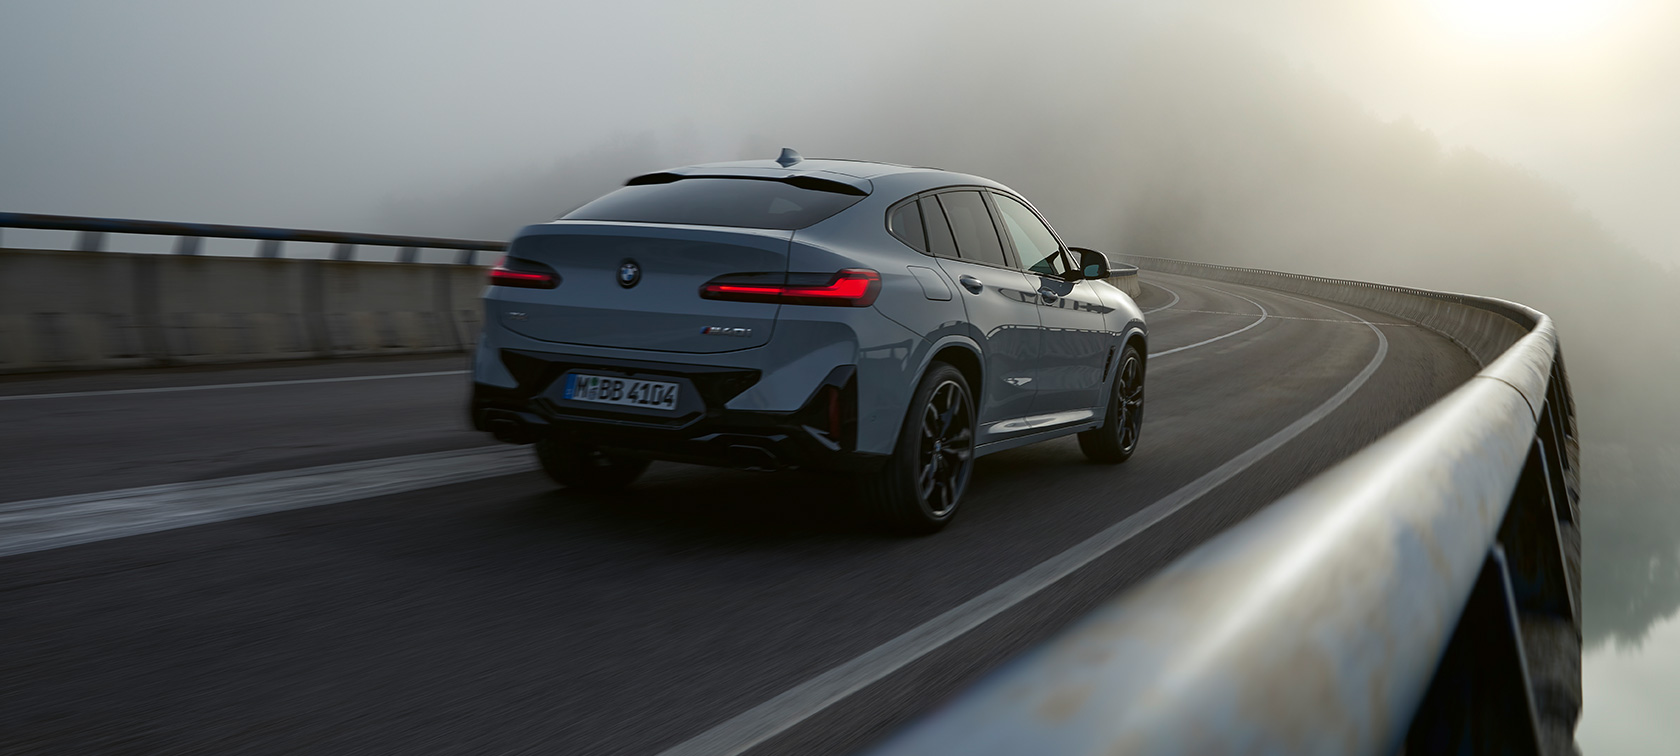 BMW X4 Design Spate